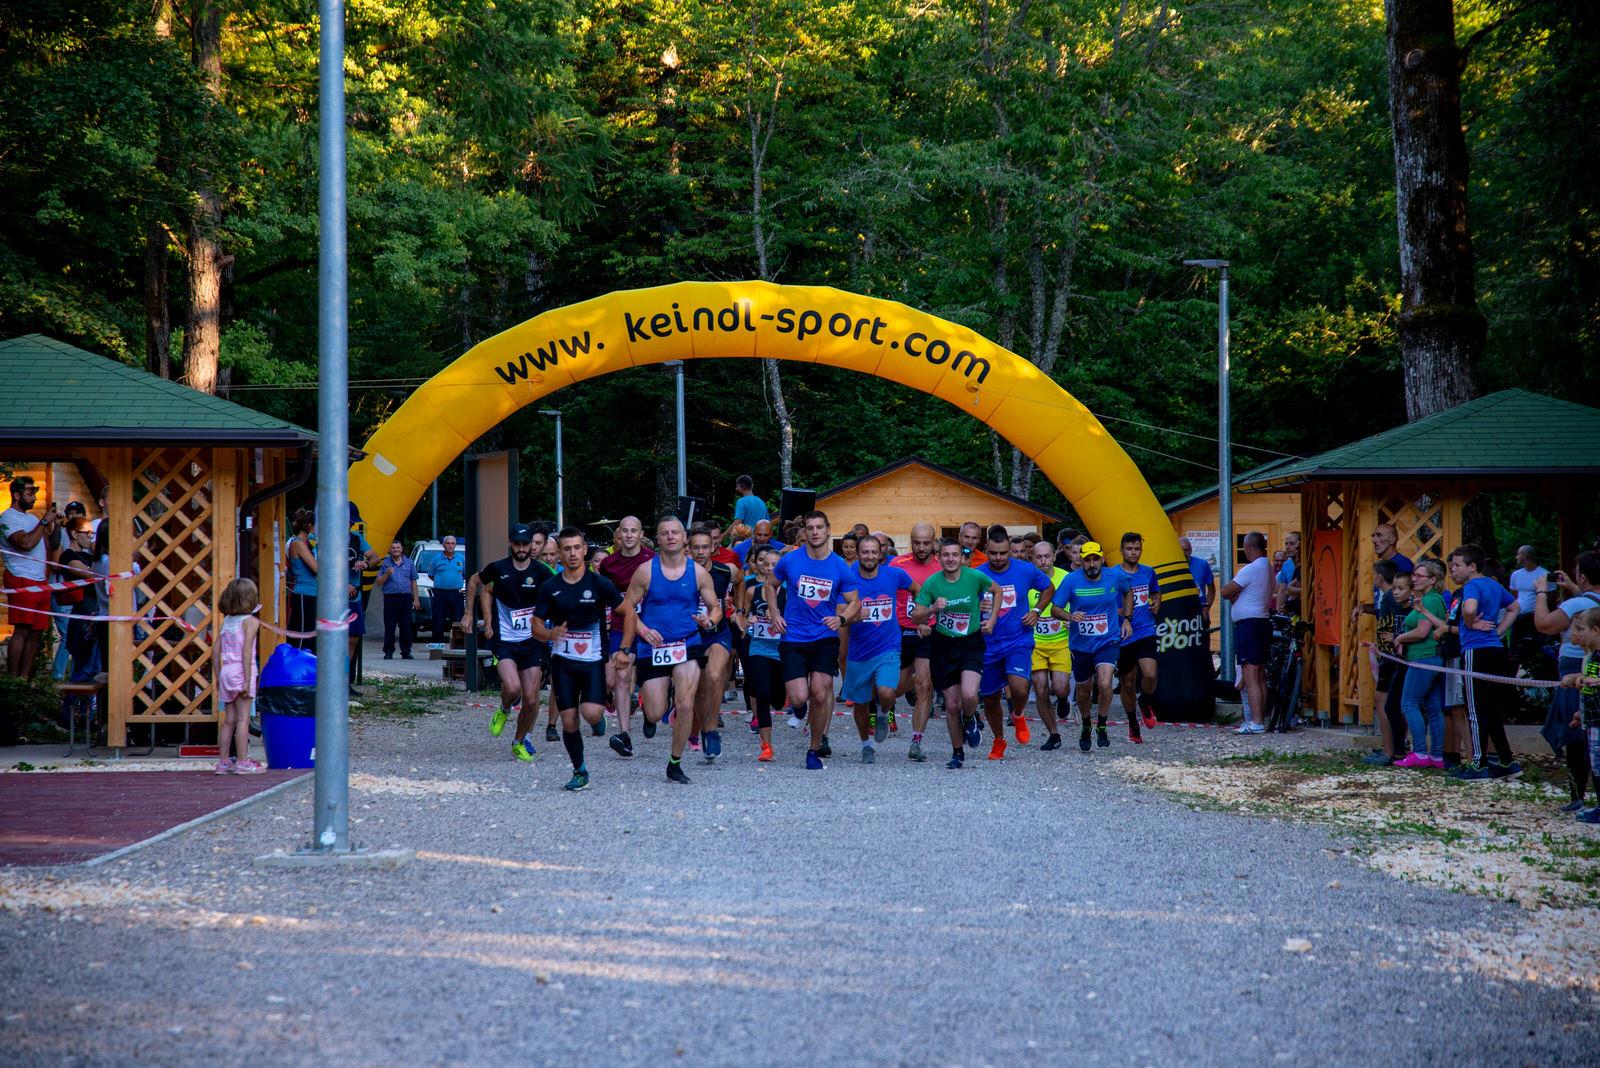 likaclub_lika night run_jasikovac_7_2020 (8)